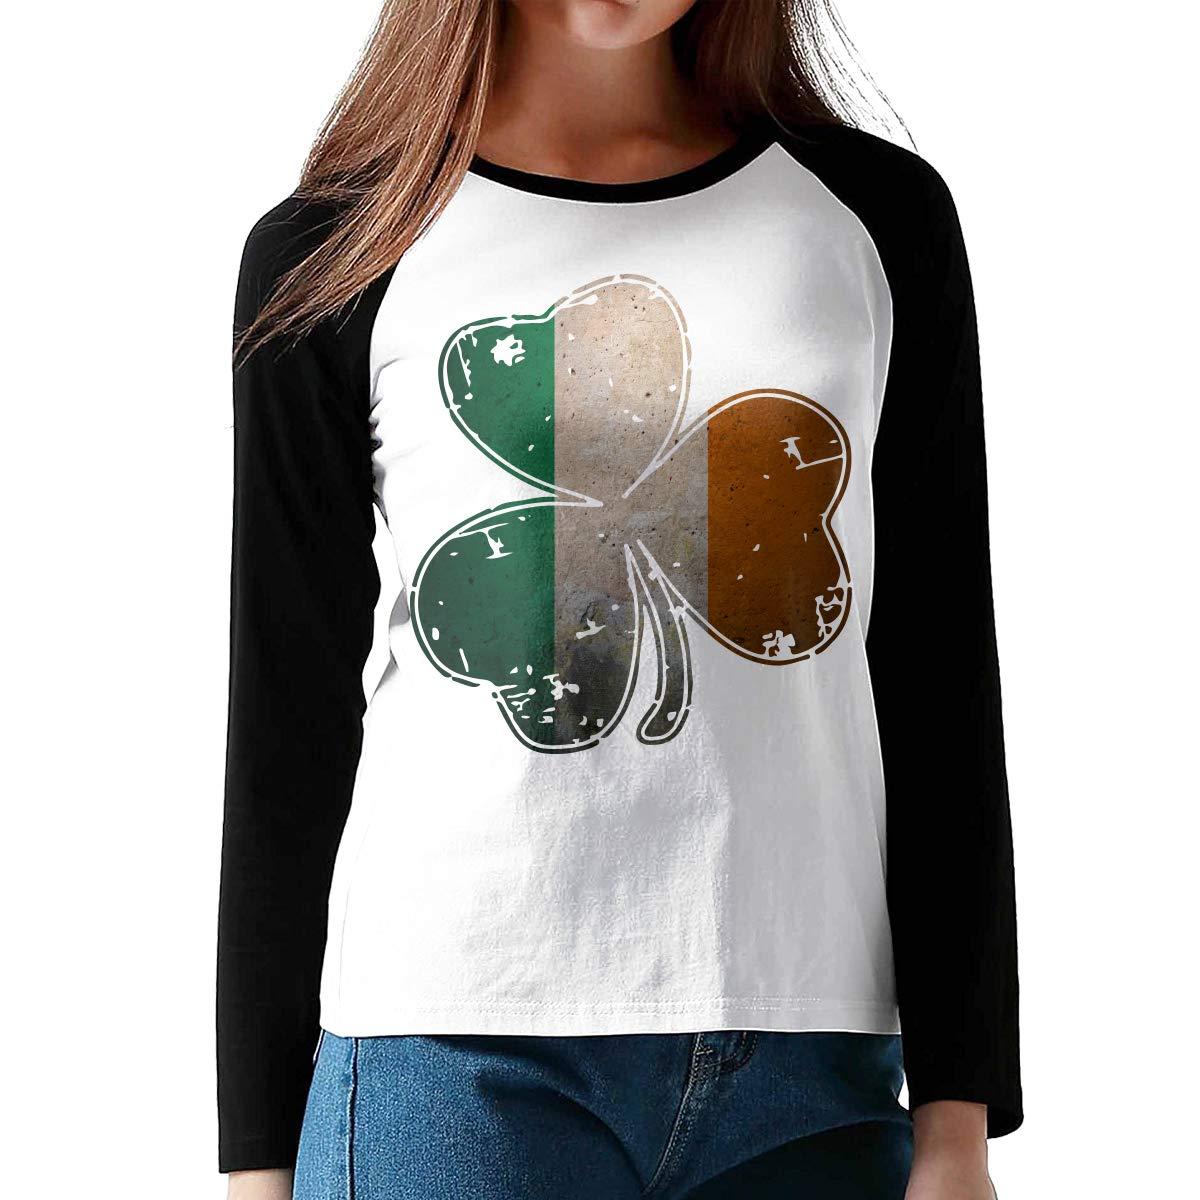 Vintage Irish Shamrock Ladies Crew Neck Tee Shirt Contrast Color Tunic Tops